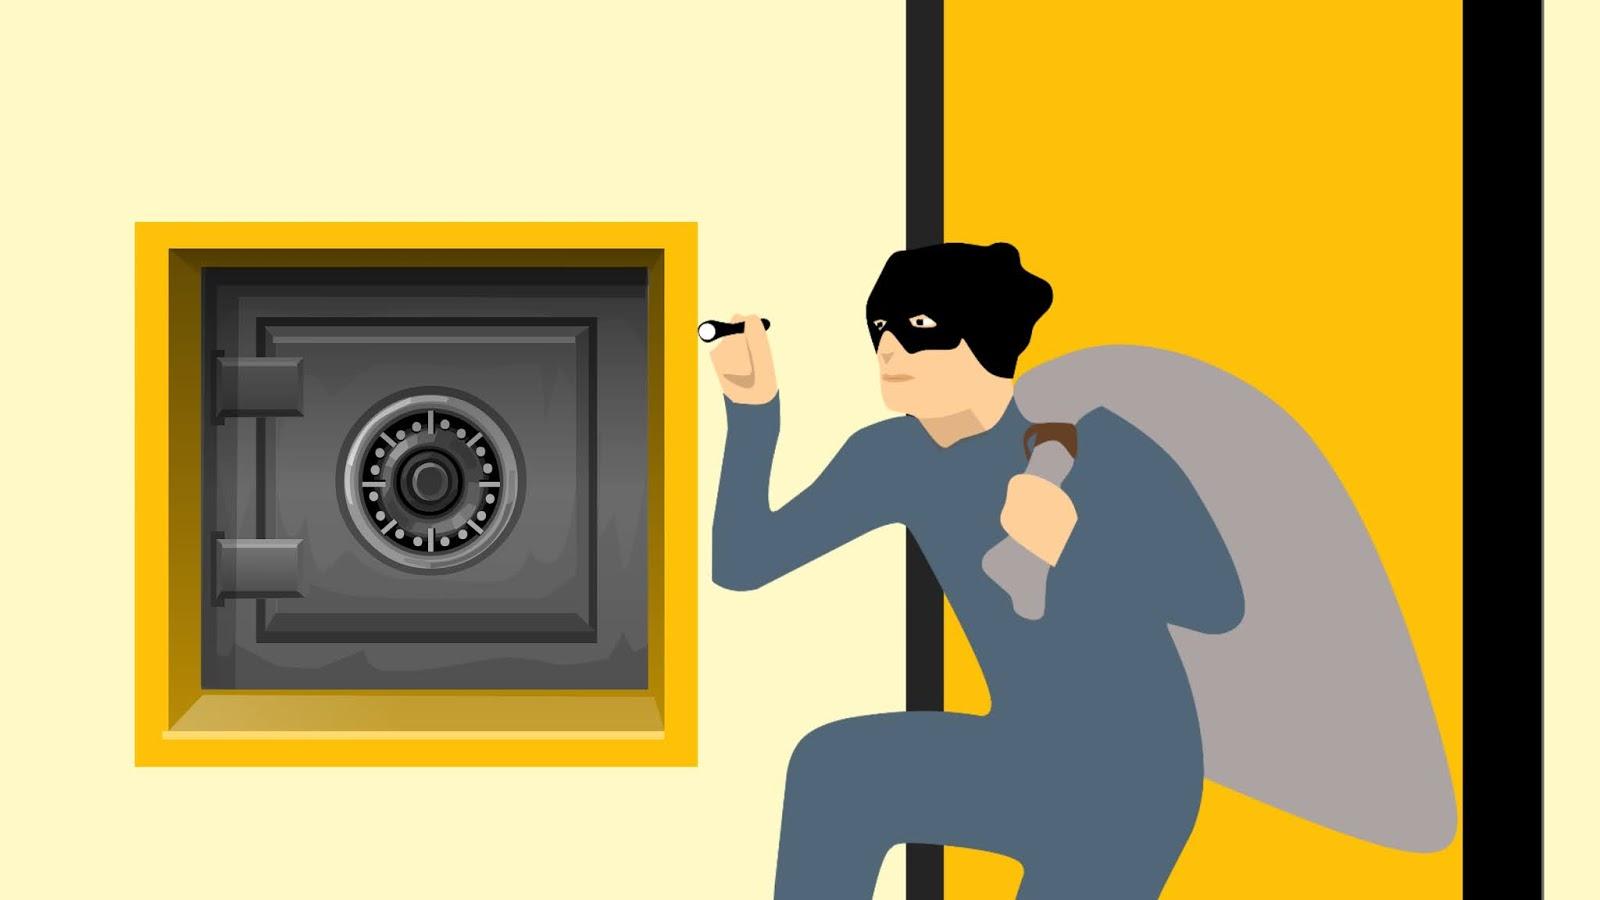 Illustration of thief and burglar cartoon character